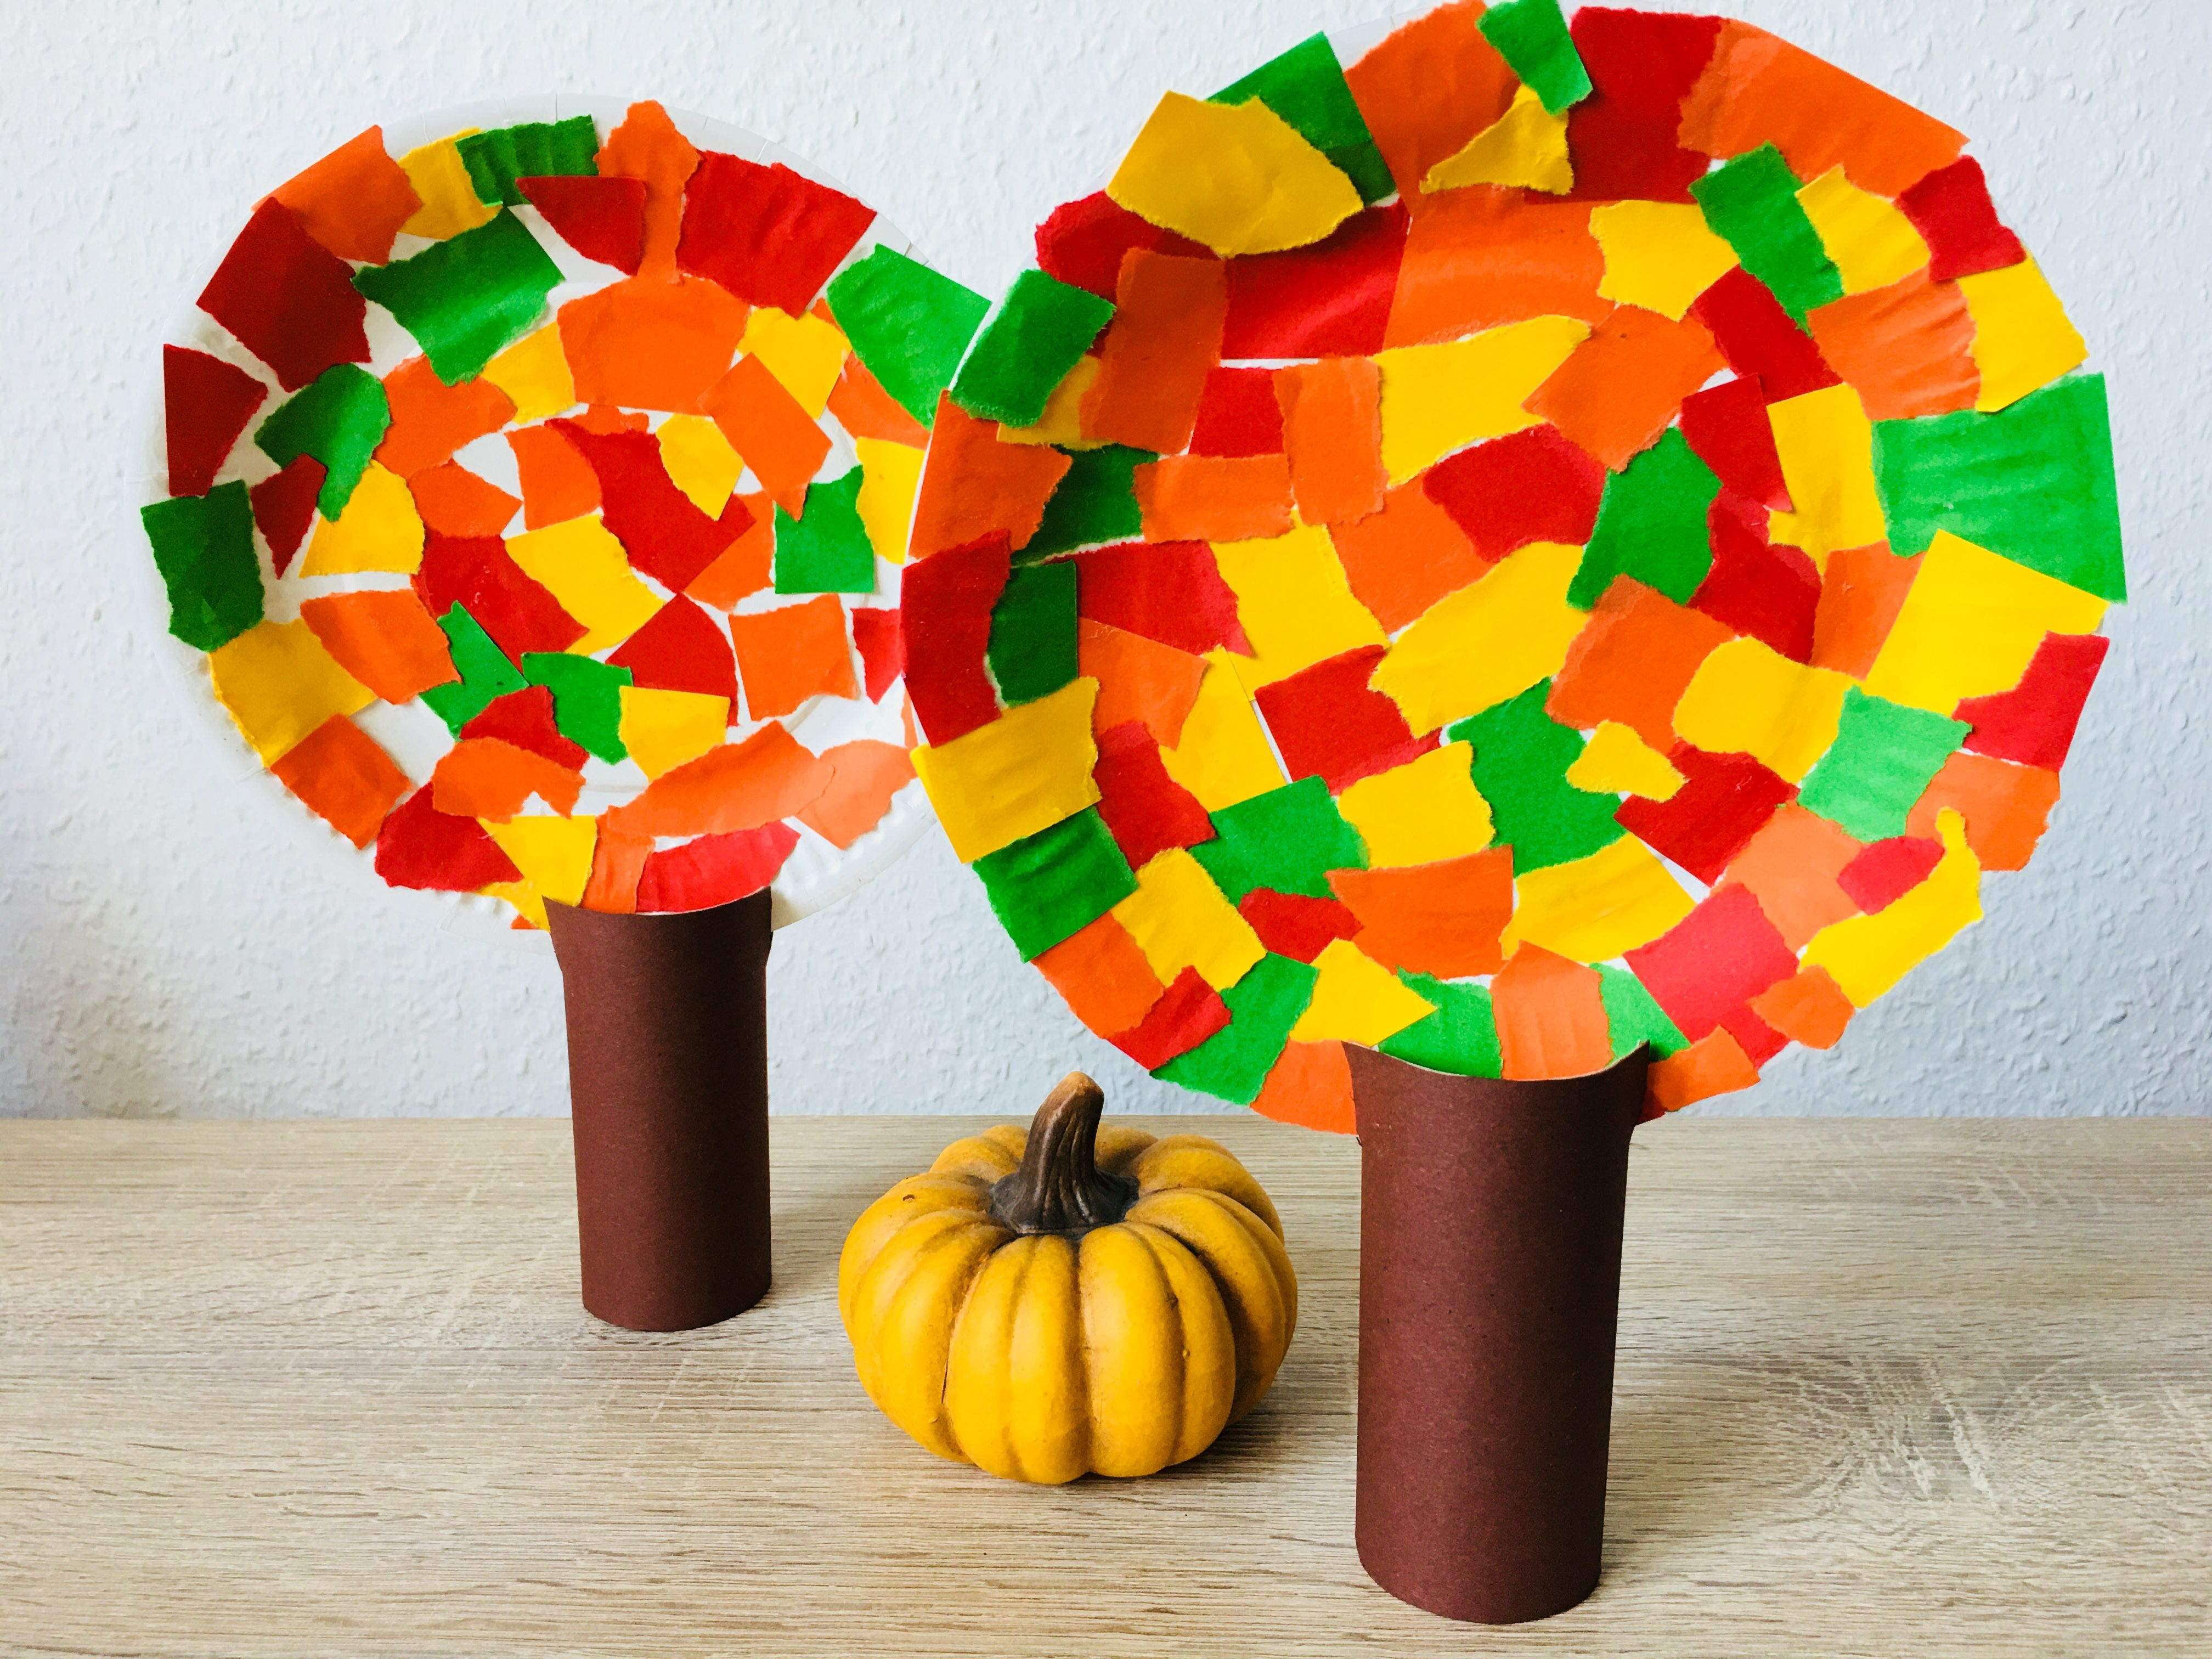 Herbstbäume Aus Pappteller Basteln Mit Kindern Activités